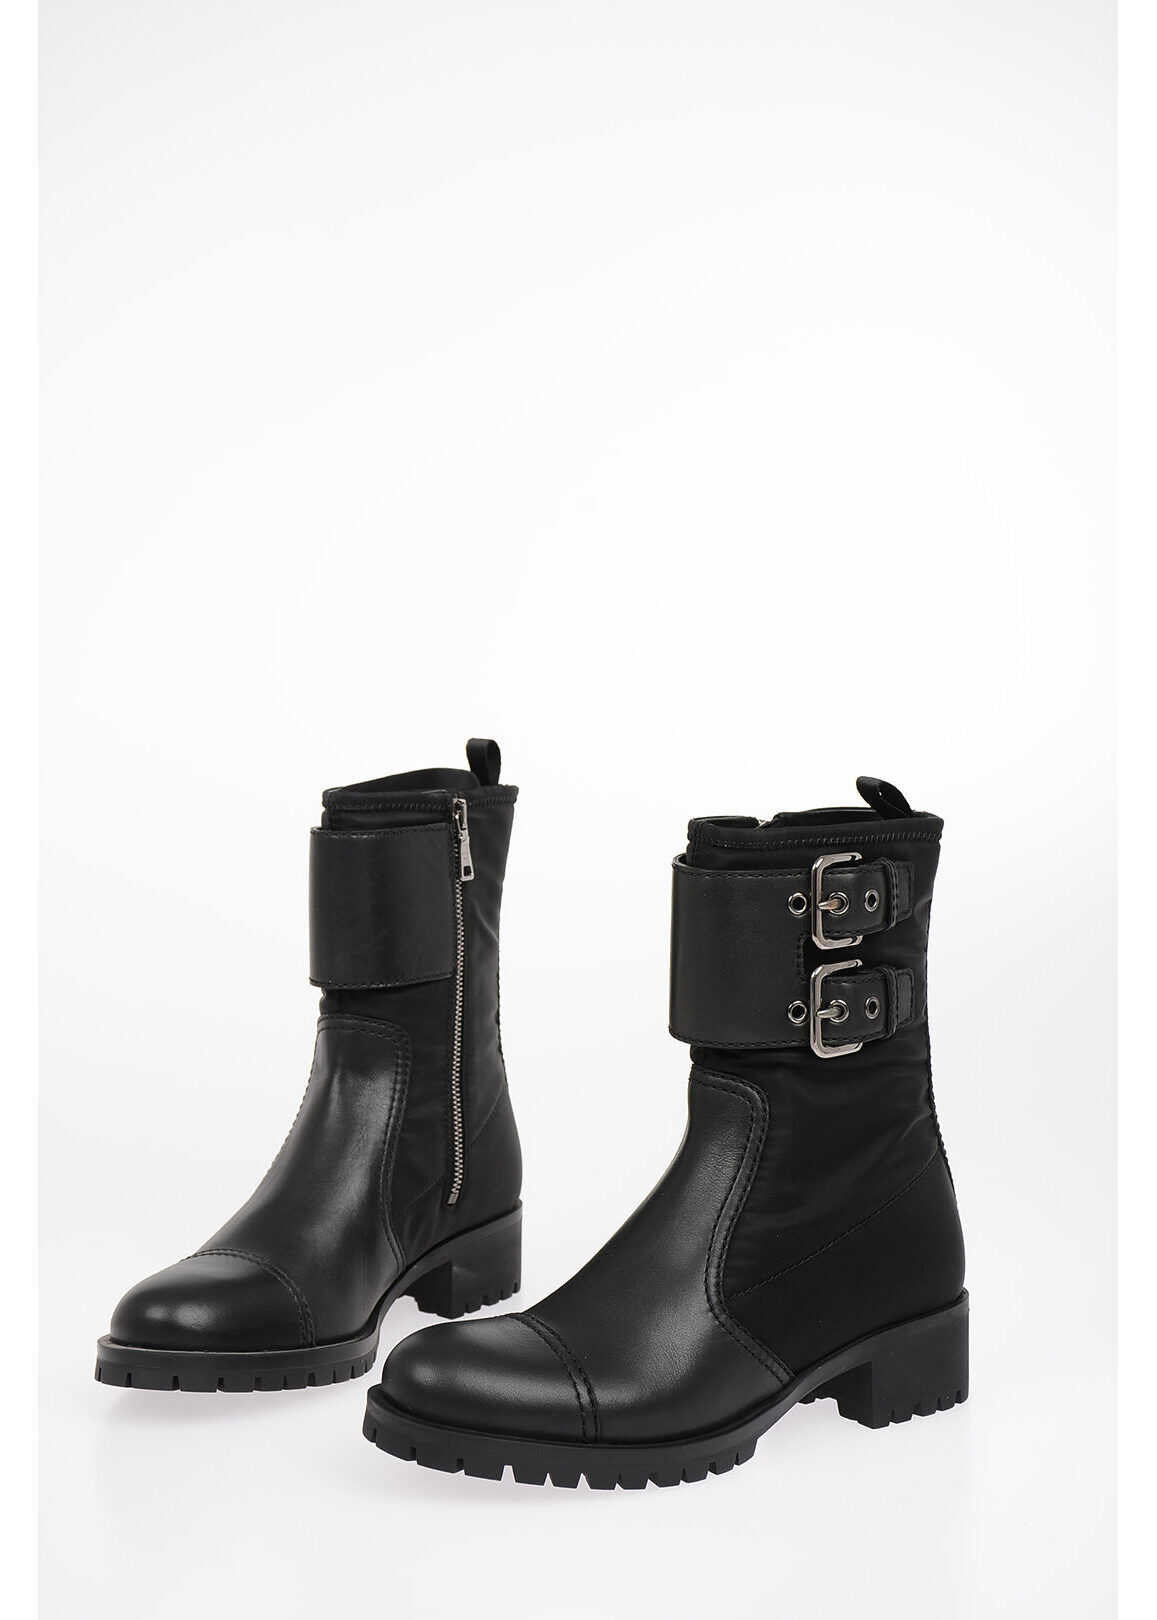 Prada 4 cm Biker Boots BLACK